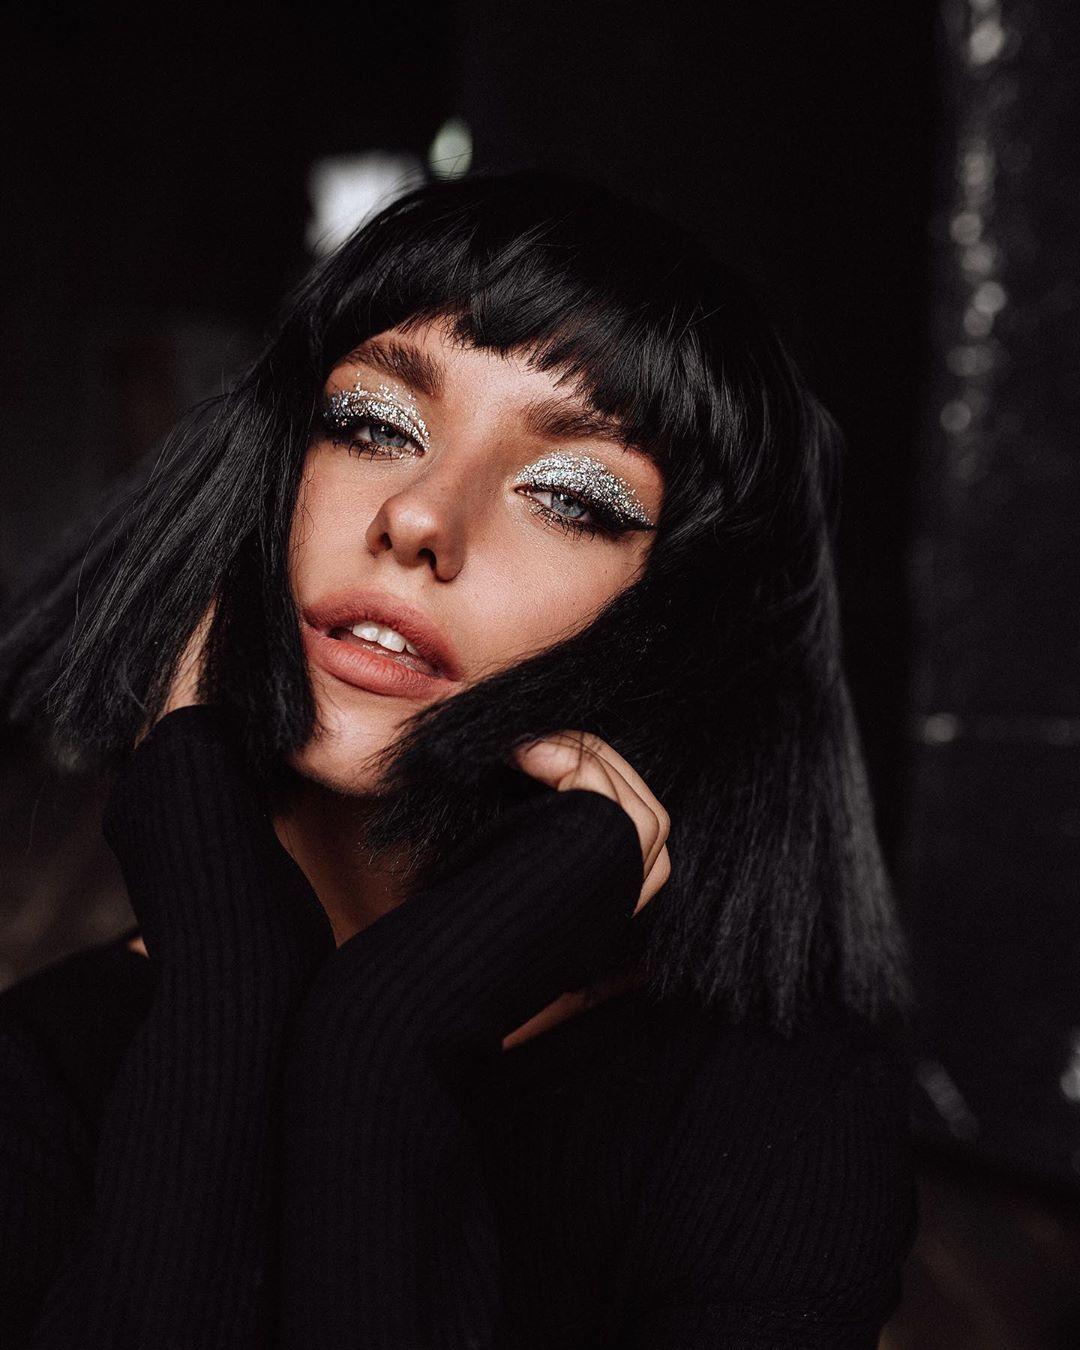 Alexandra-Burimova-Wallpapers-Insta-Fit-BIo-8